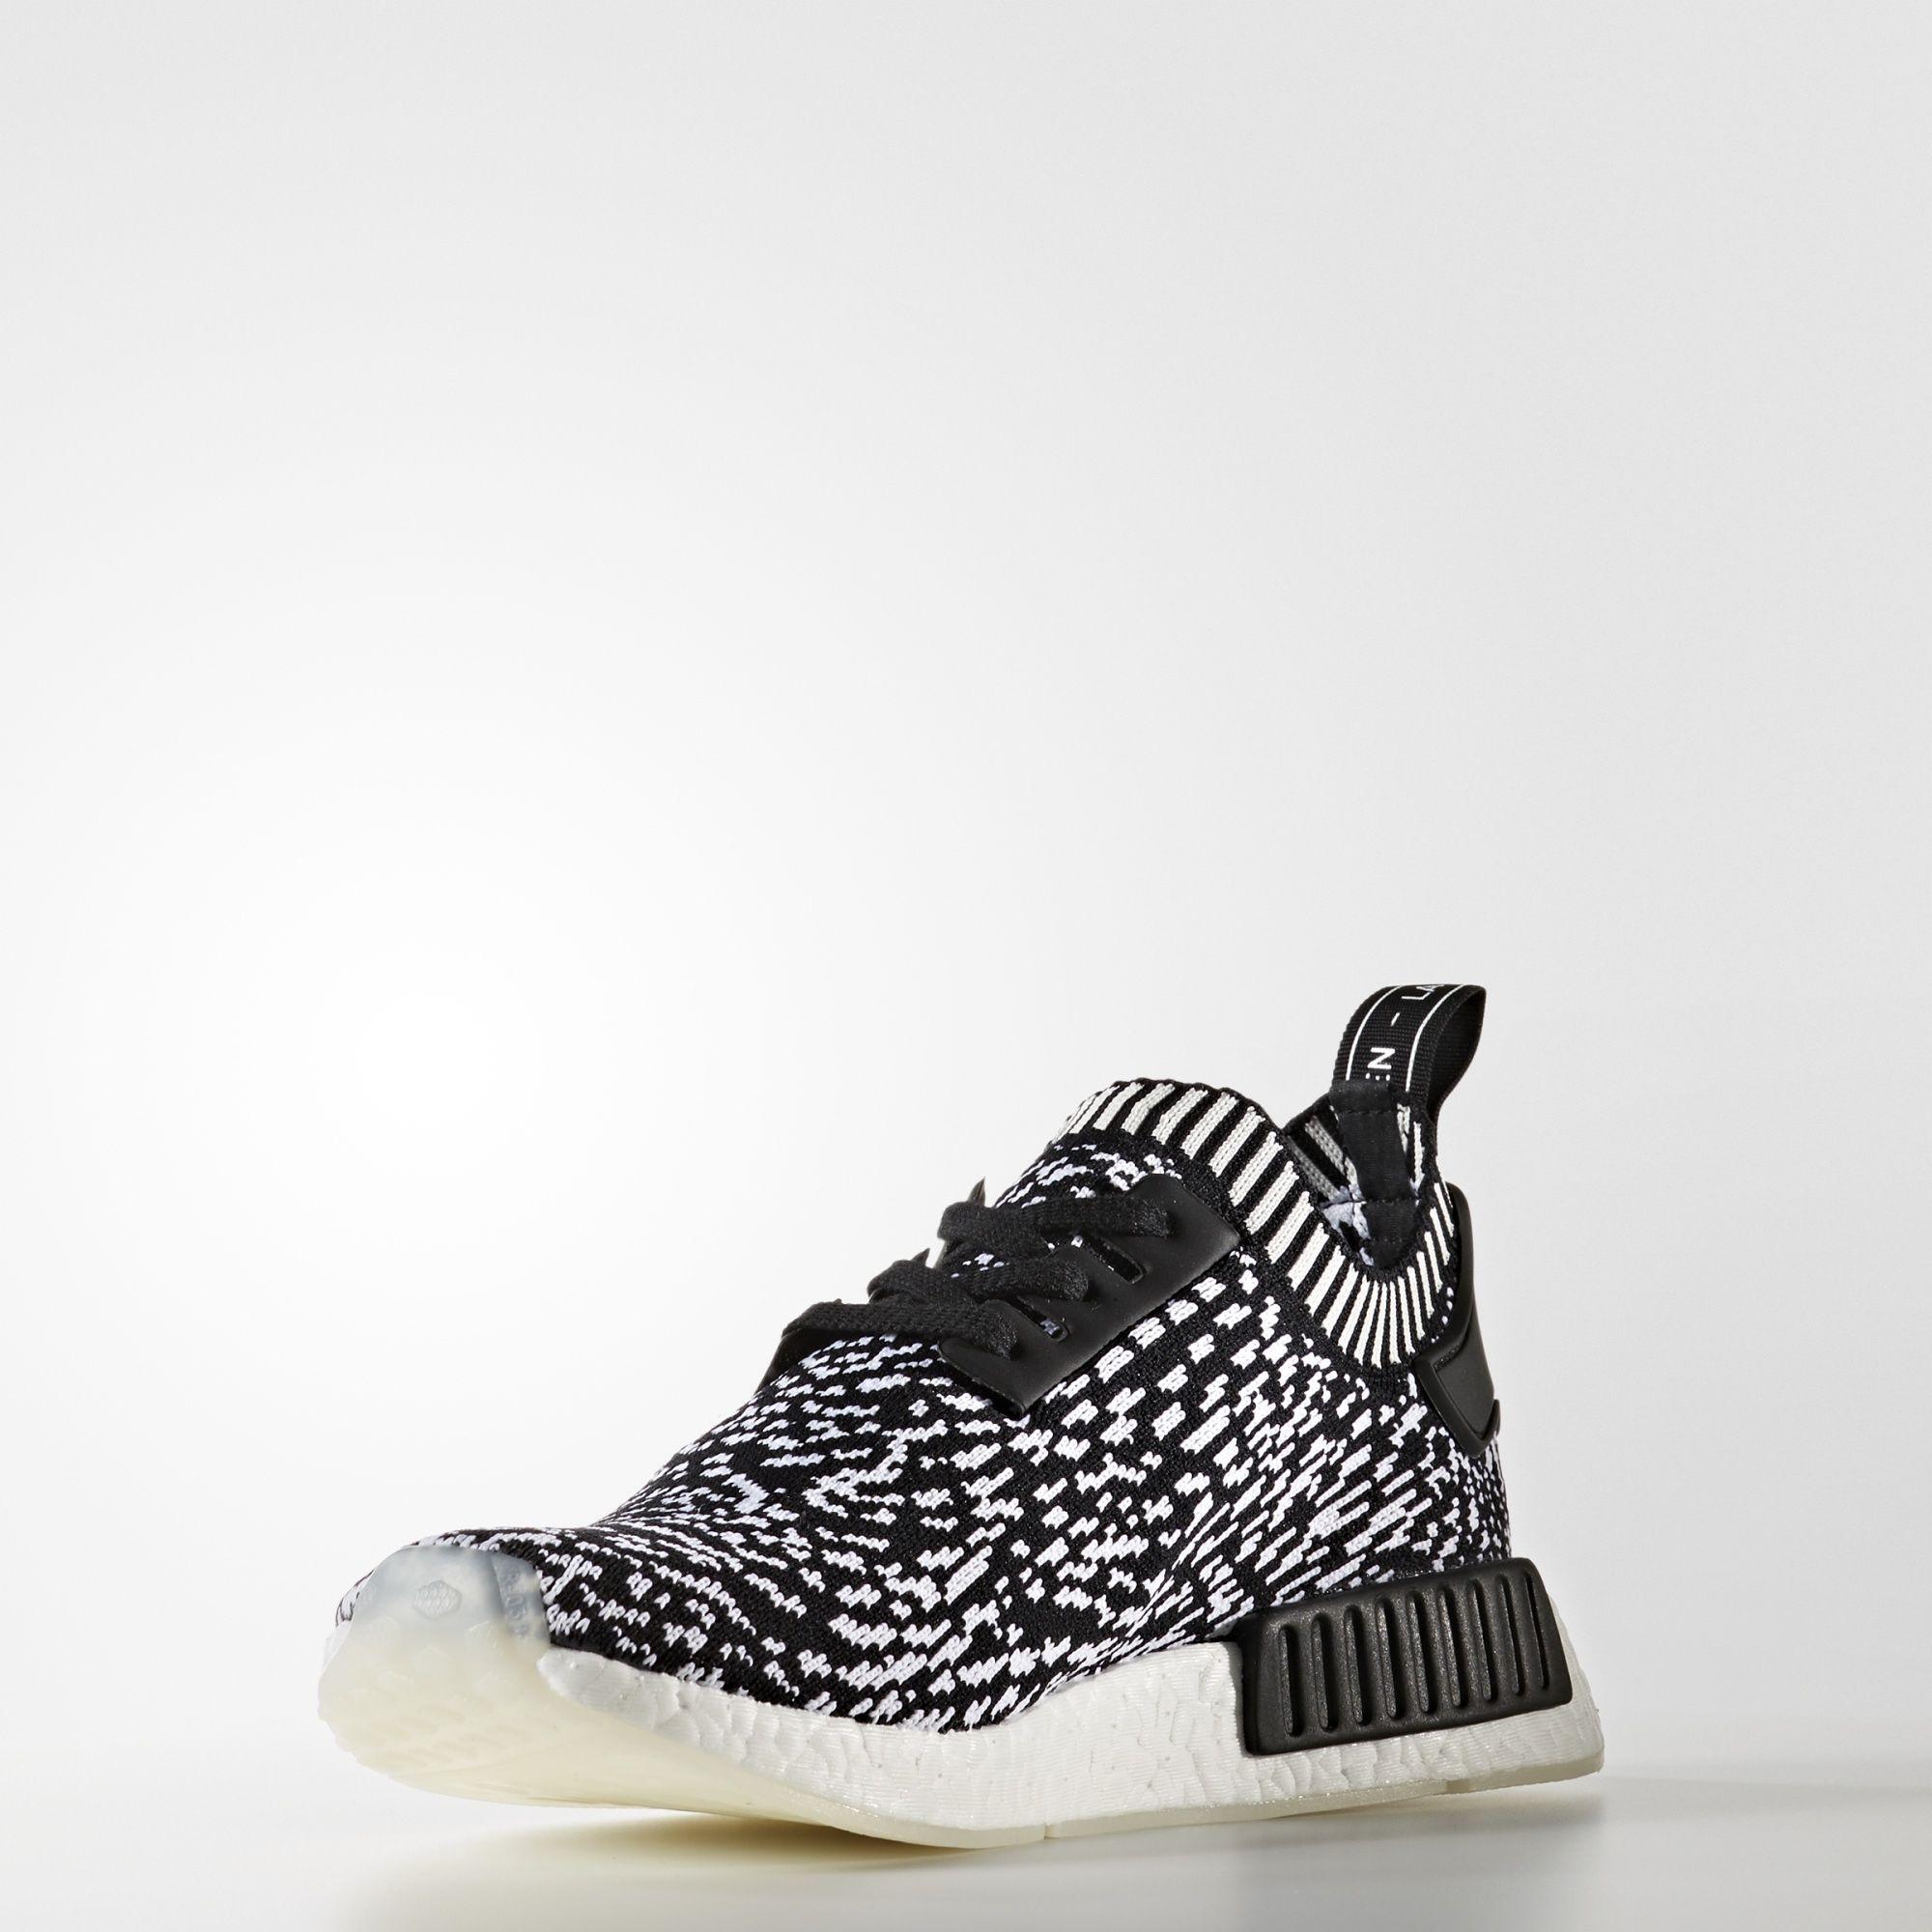 BY3013 adidas NMD R1 Primeknit Black White 2